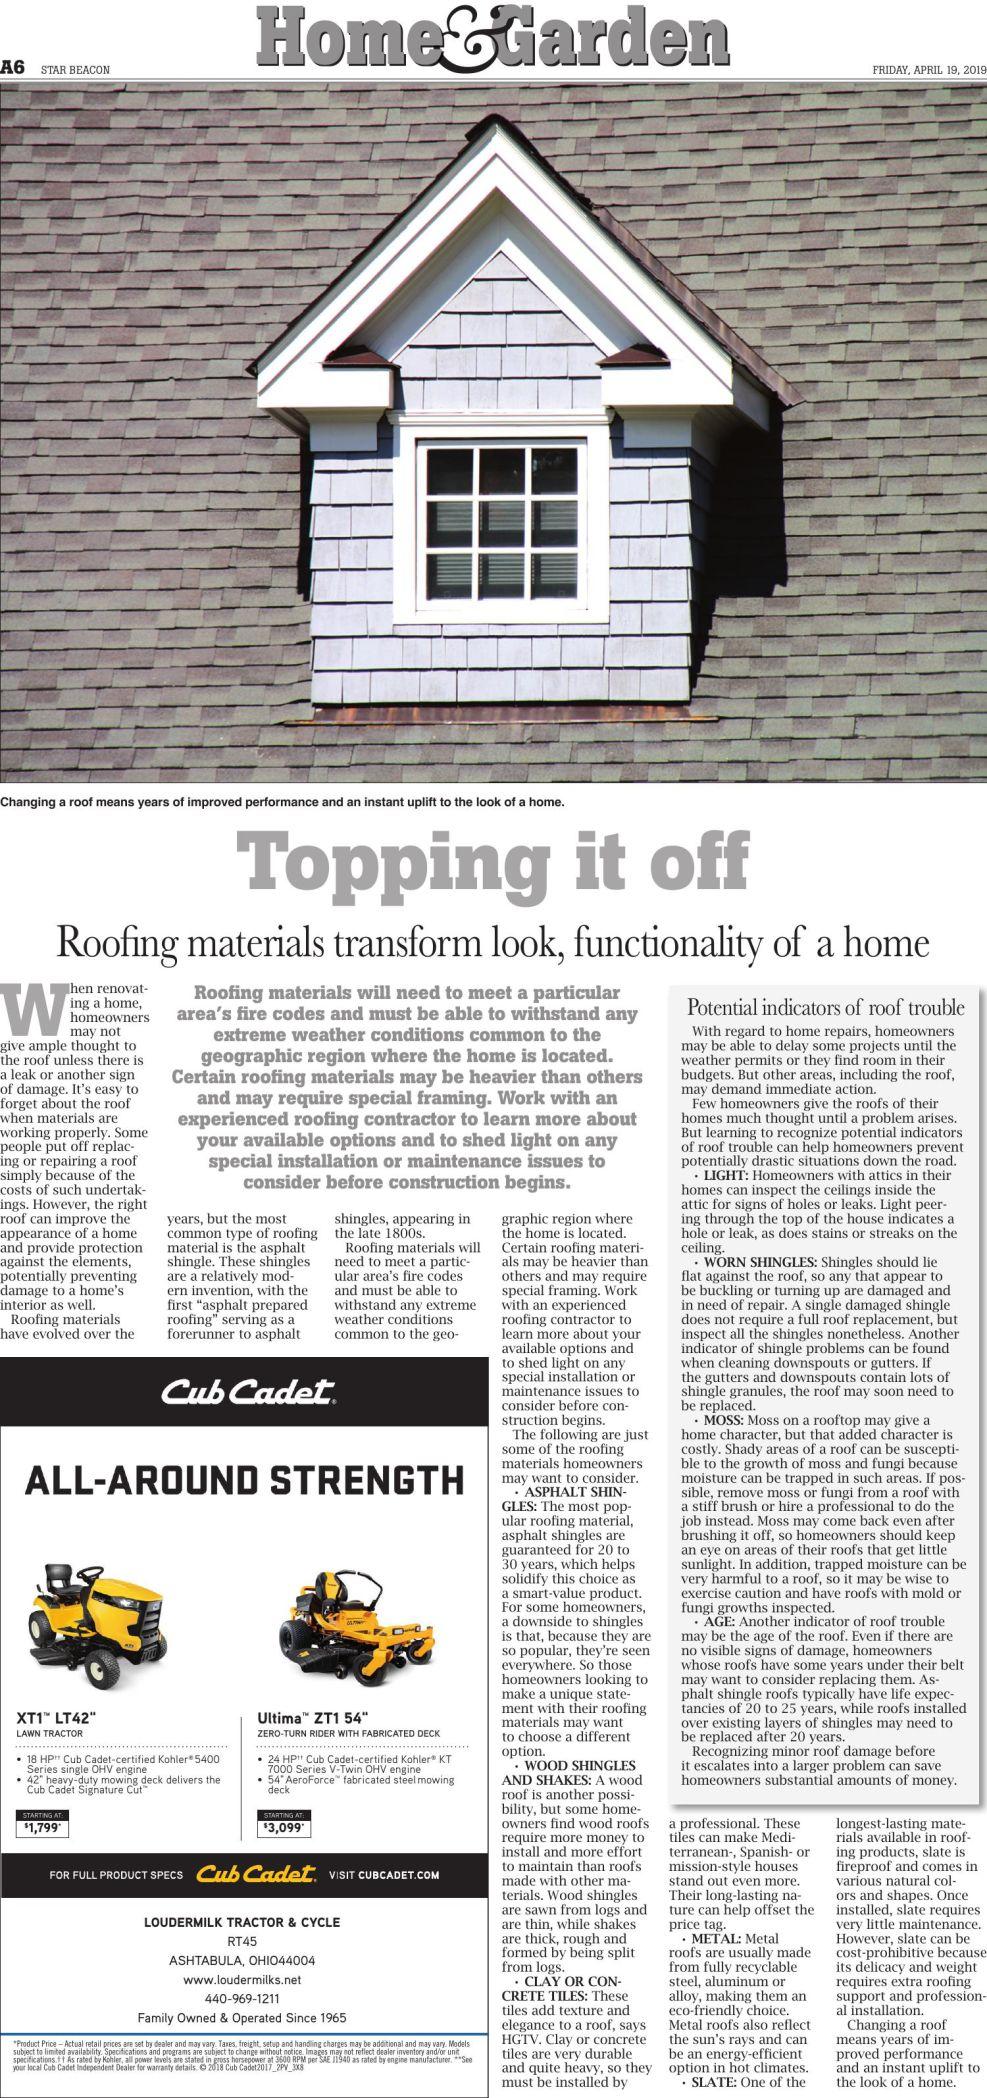 Home & Garden - April 19 Page 1